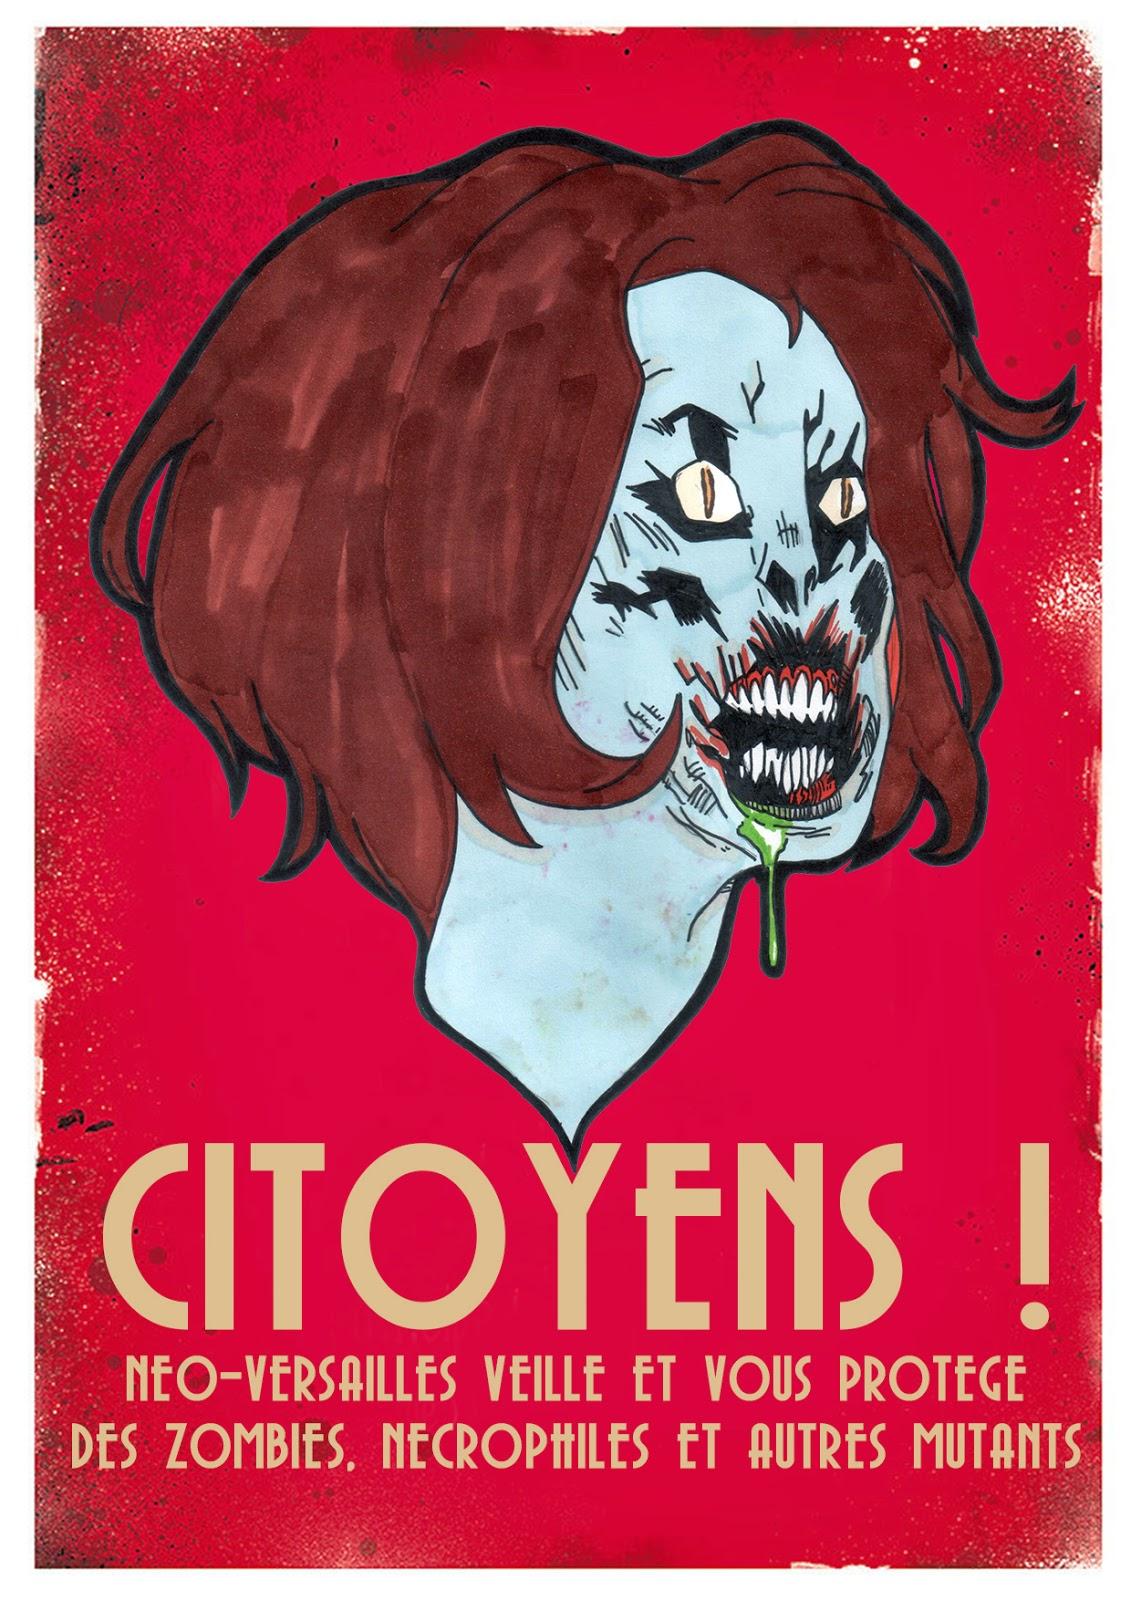 Affiches de propagandes de Neo-Versailles par The Terror Geek Neoversailles7